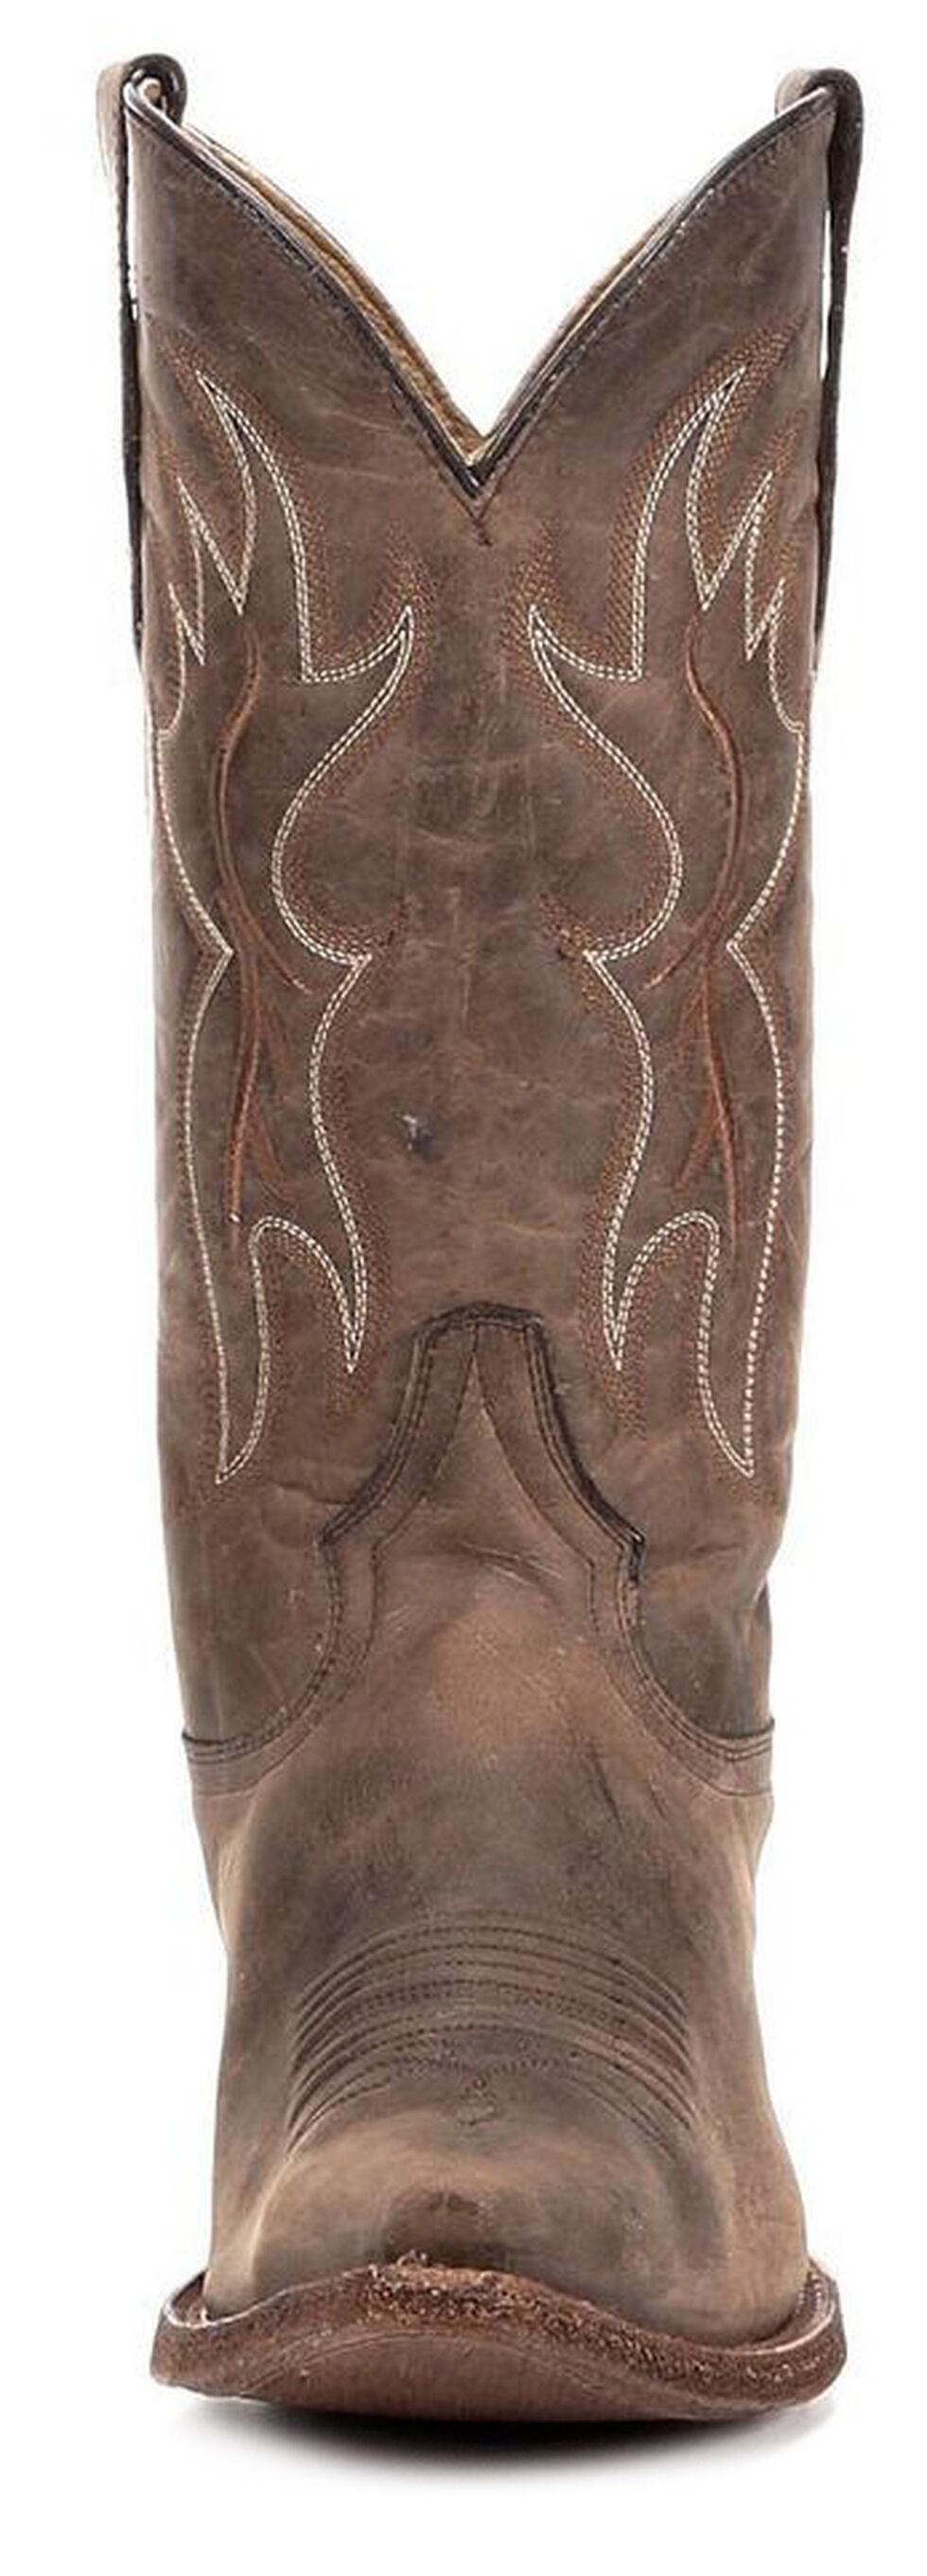 Circle G Men's Tan Basic Western Boots - Snip Toe, Tan, hi-res